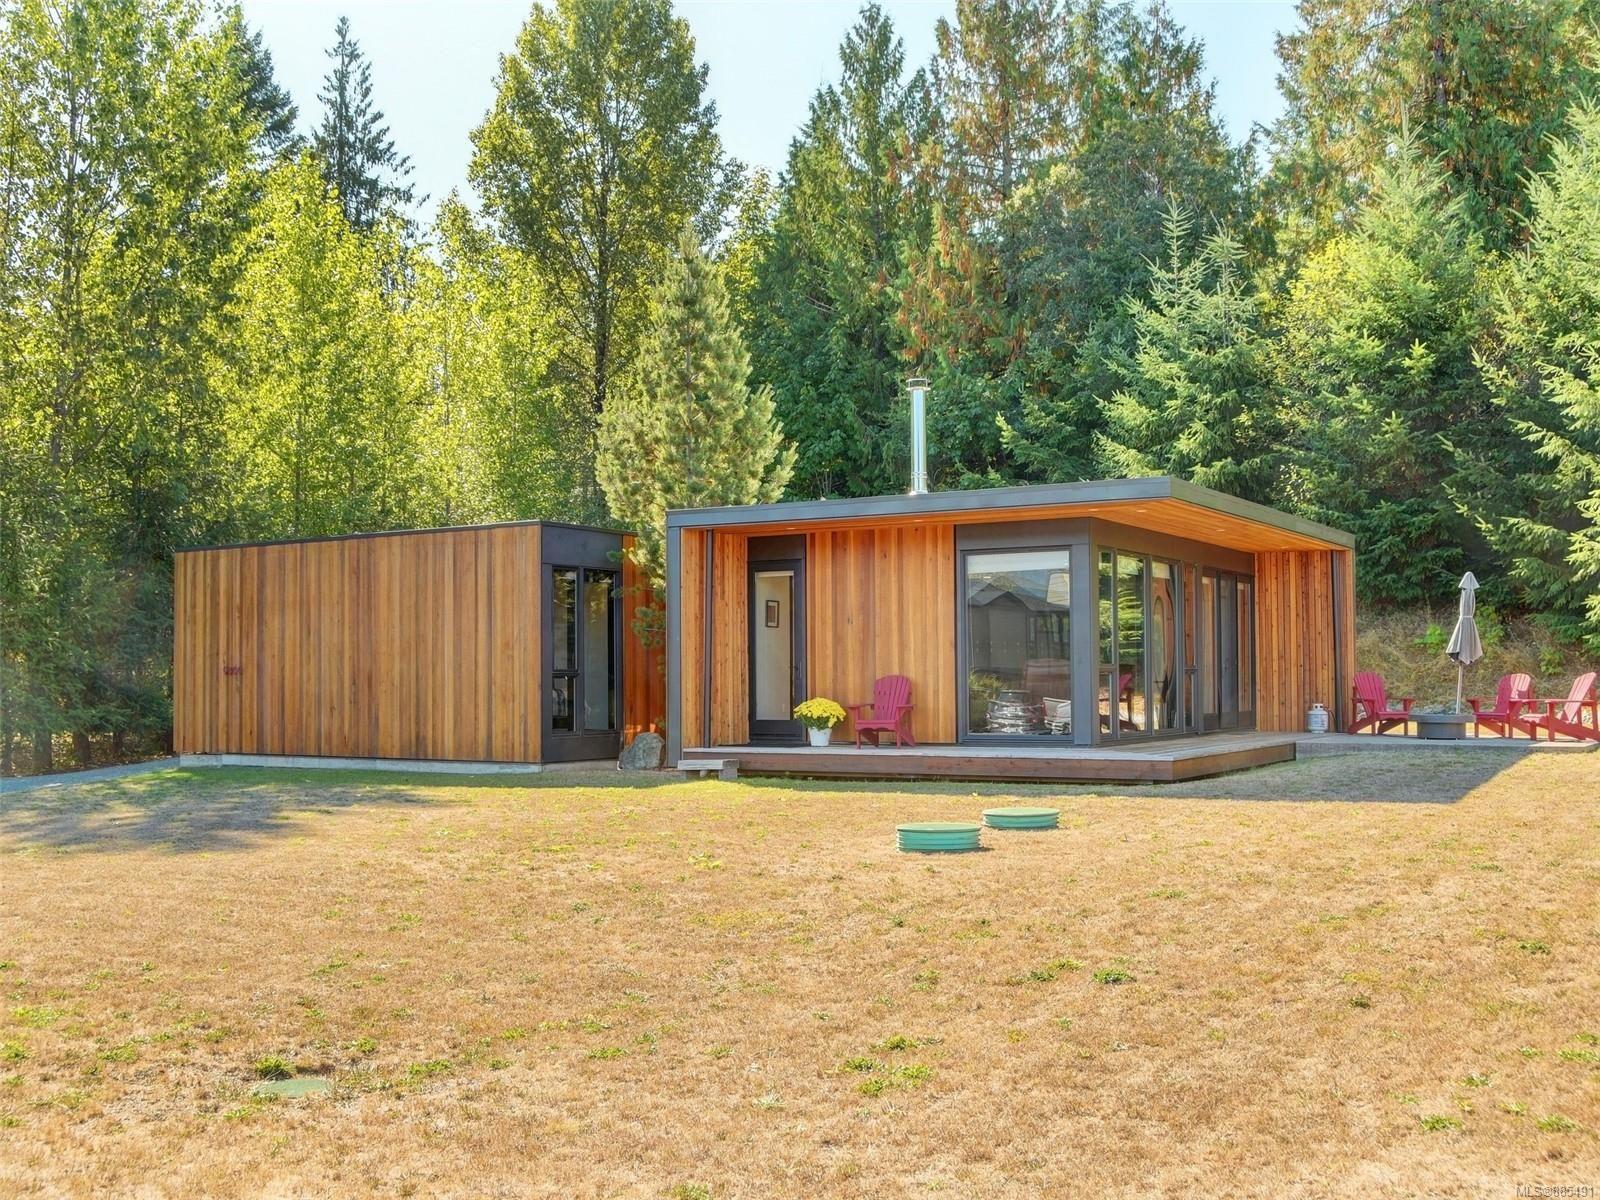 Main Photo: 9866 Stin-Qua Rd in : Du Honeymoon Bay House for sale (Duncan)  : MLS®# 885491